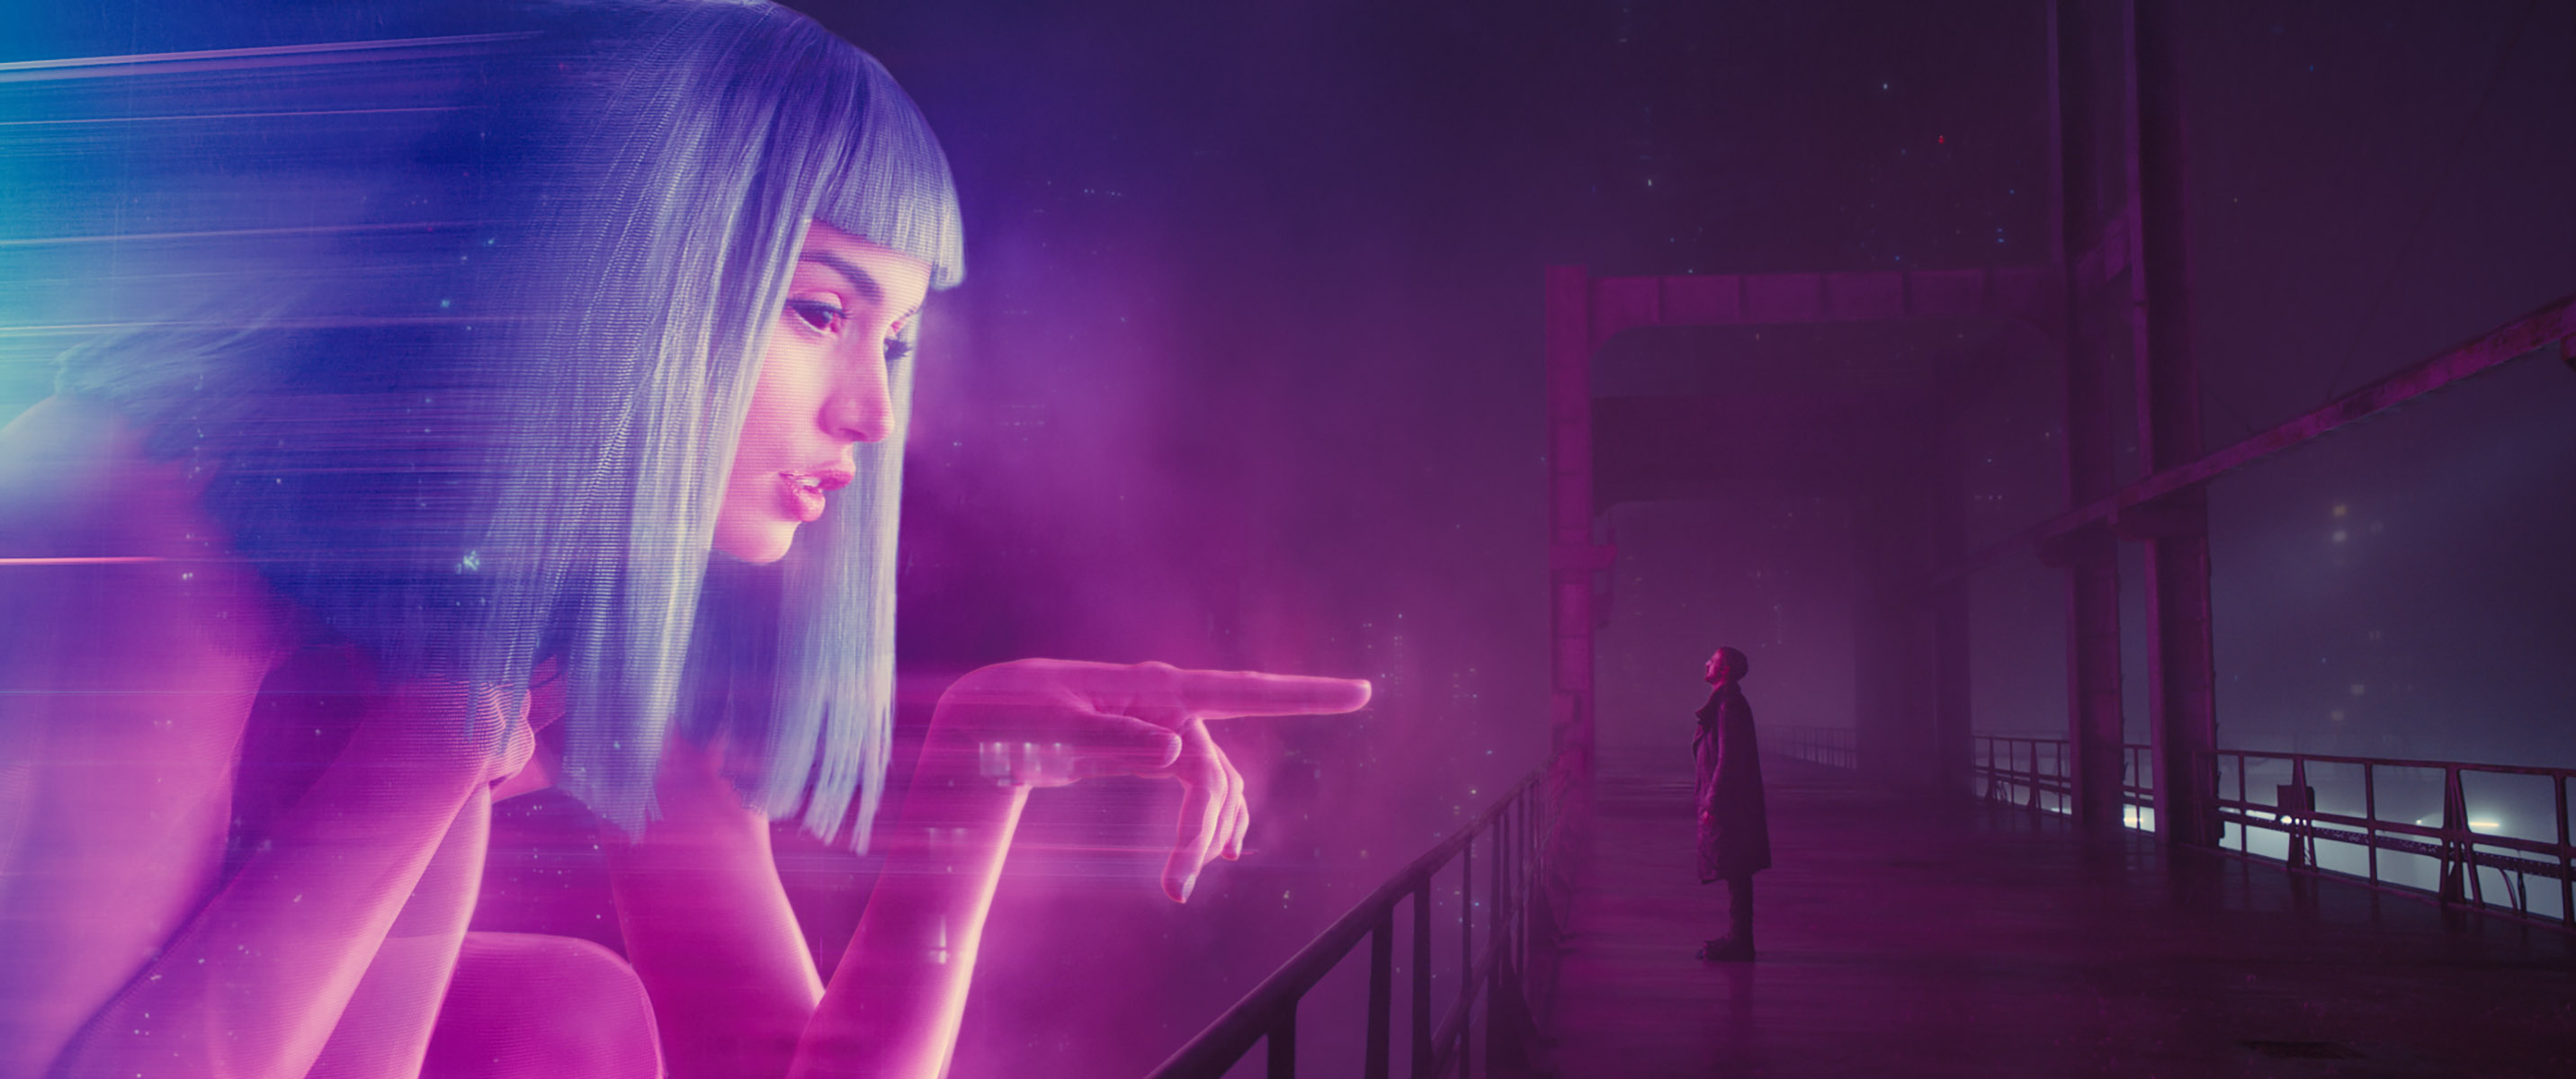 Blade Runner 2049 ¿Era necesario?